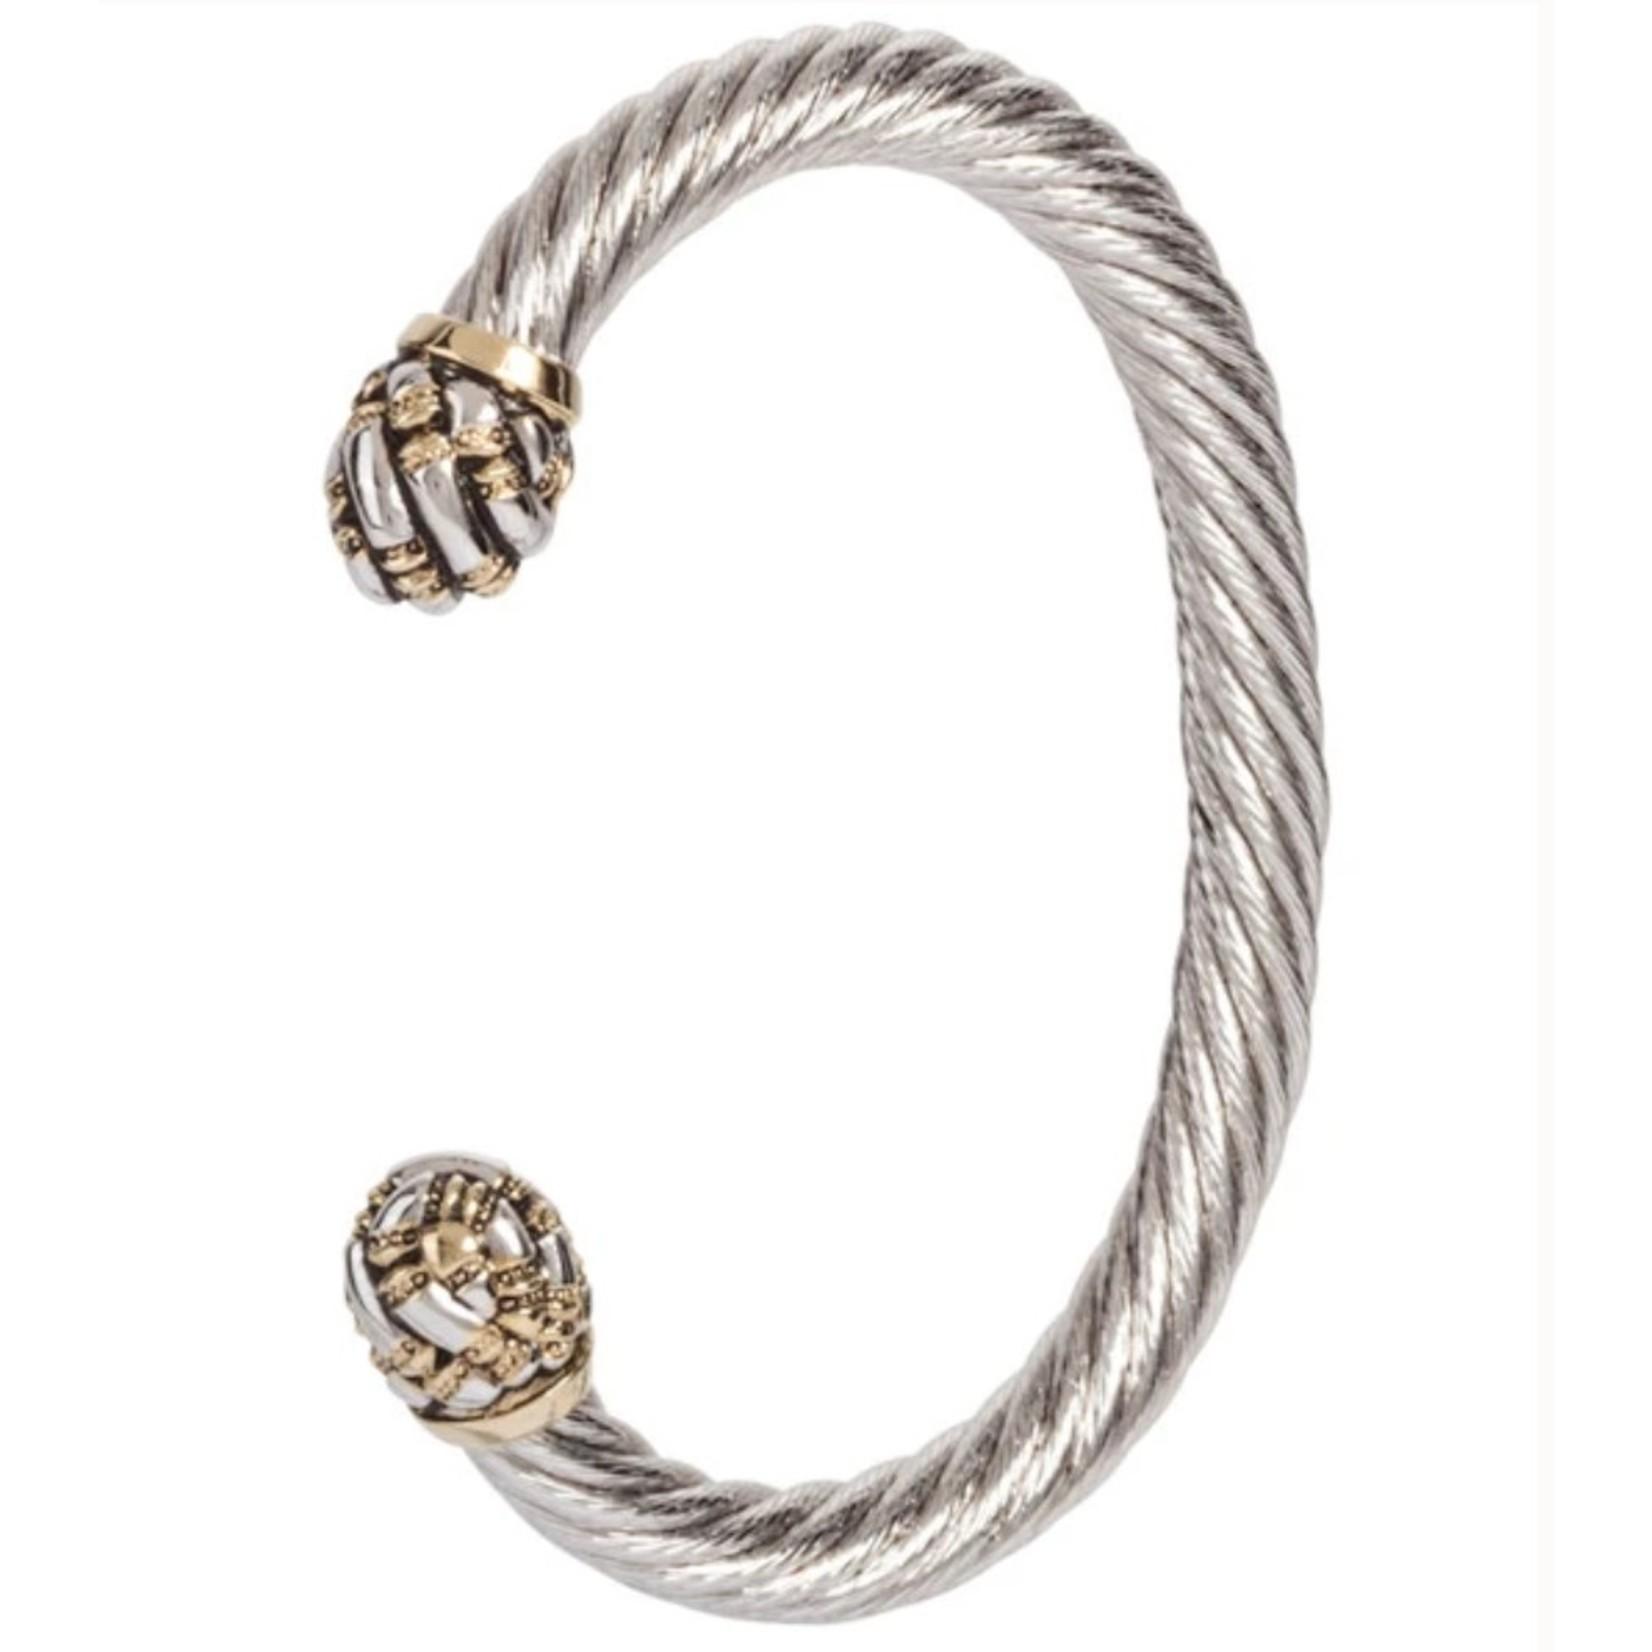 John Medeiros John Mederios Large Wire Cuff Bracelet